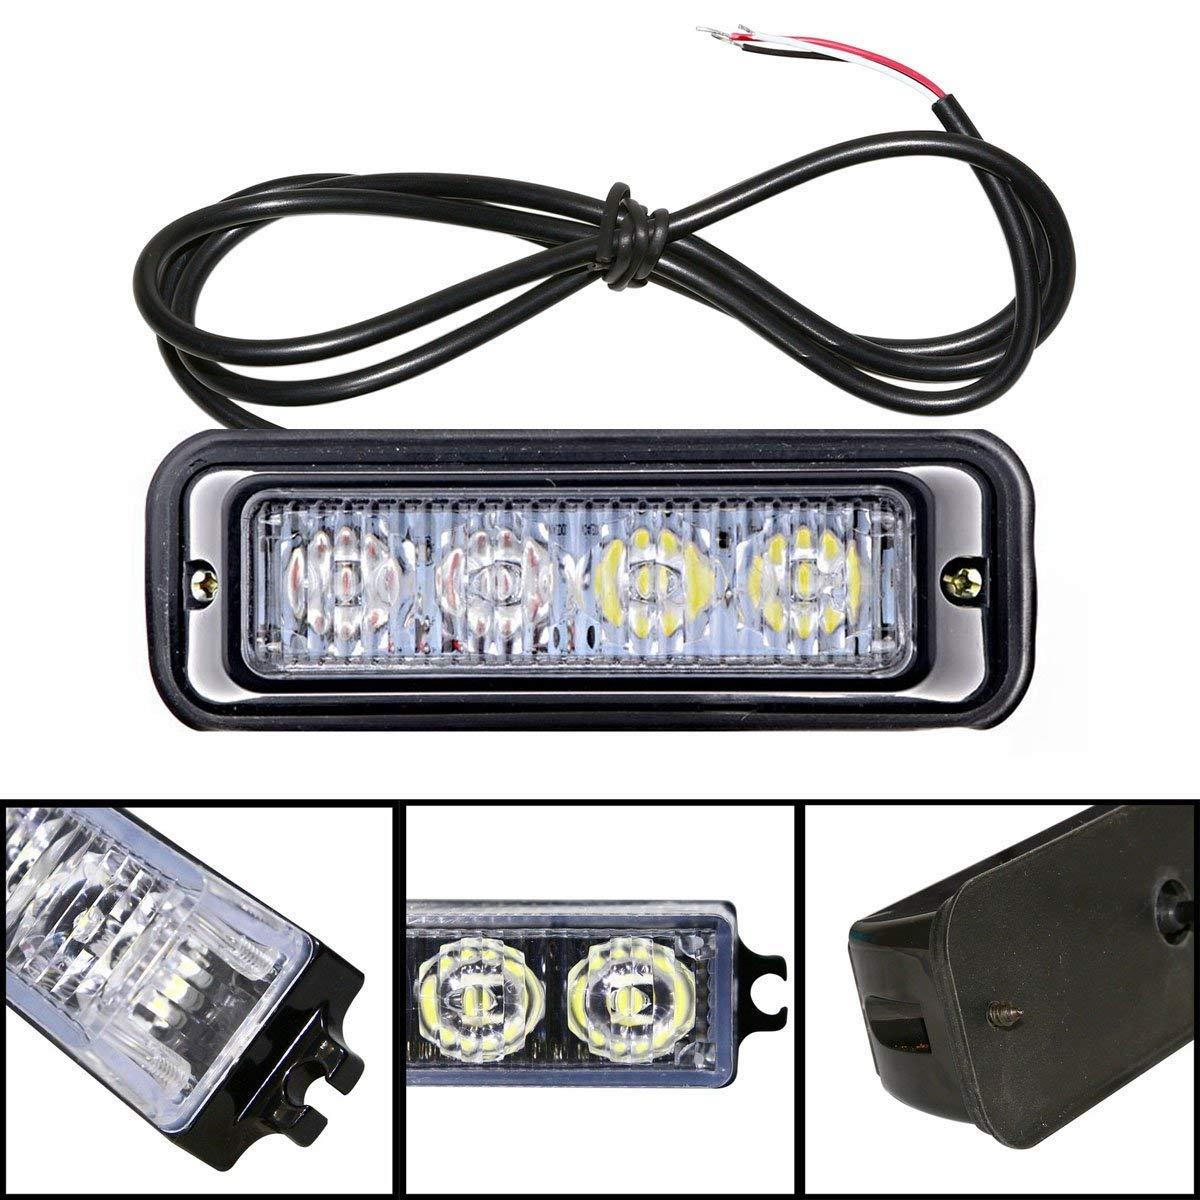 Favson 4 LED Strobe Lights for Trucks Cars Van with High Intensity White/&Yellow Emergency Flasher 2pcs